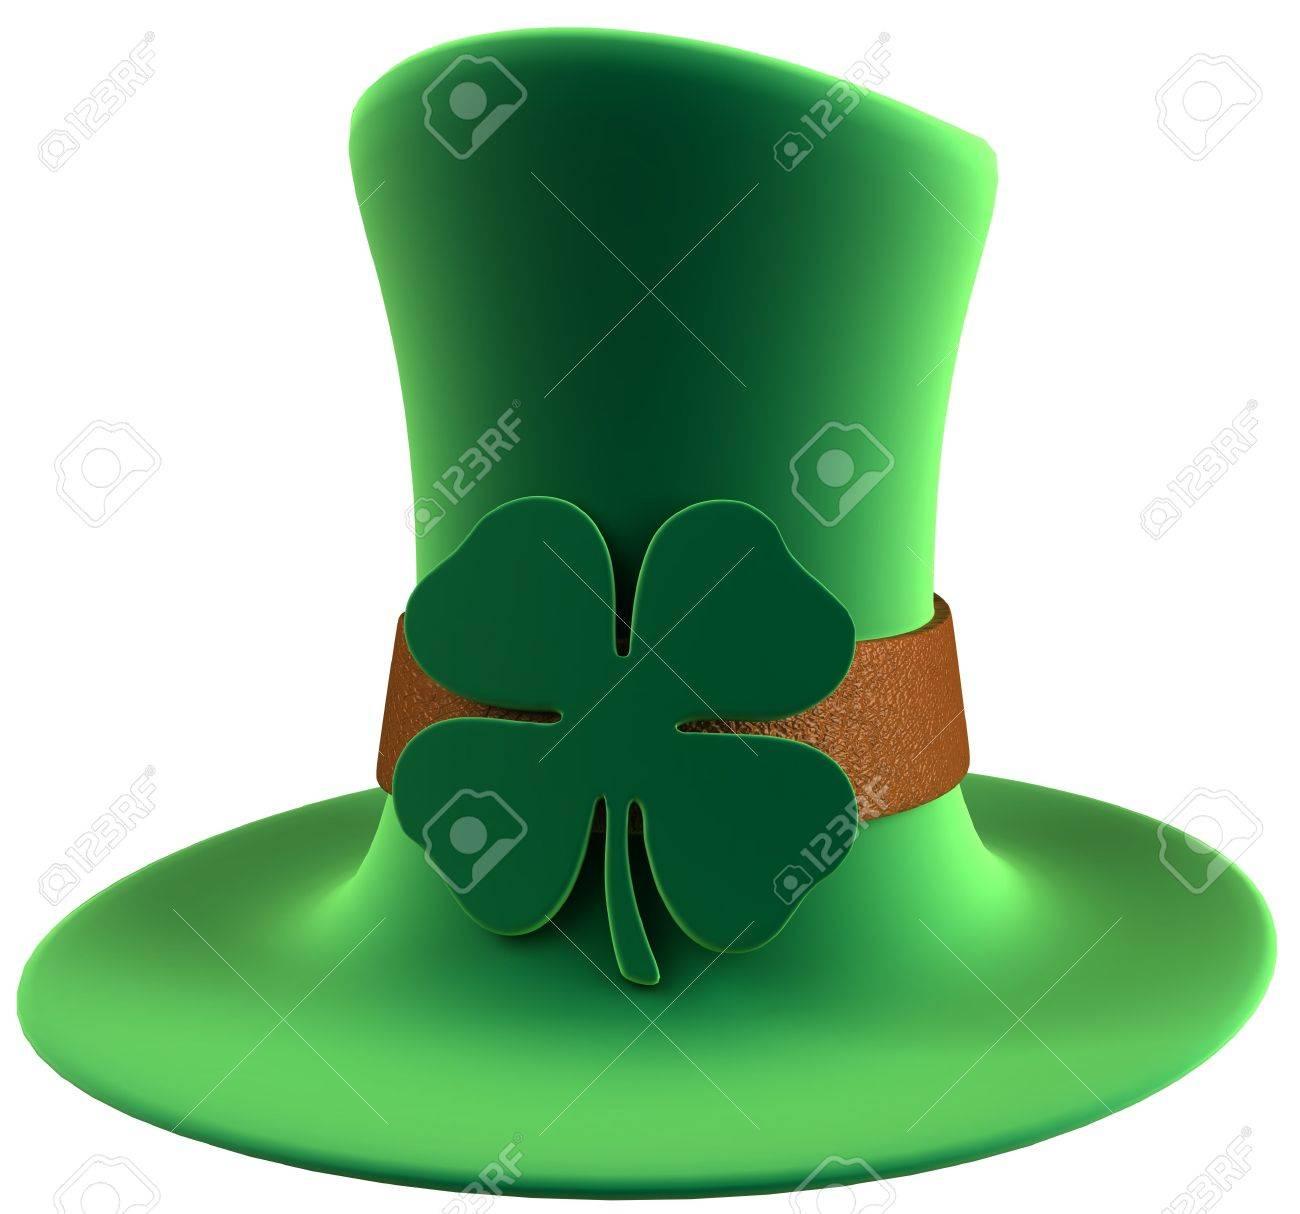 st patrick u0027s day leprechaun u0027s green velvet hat with four leaf